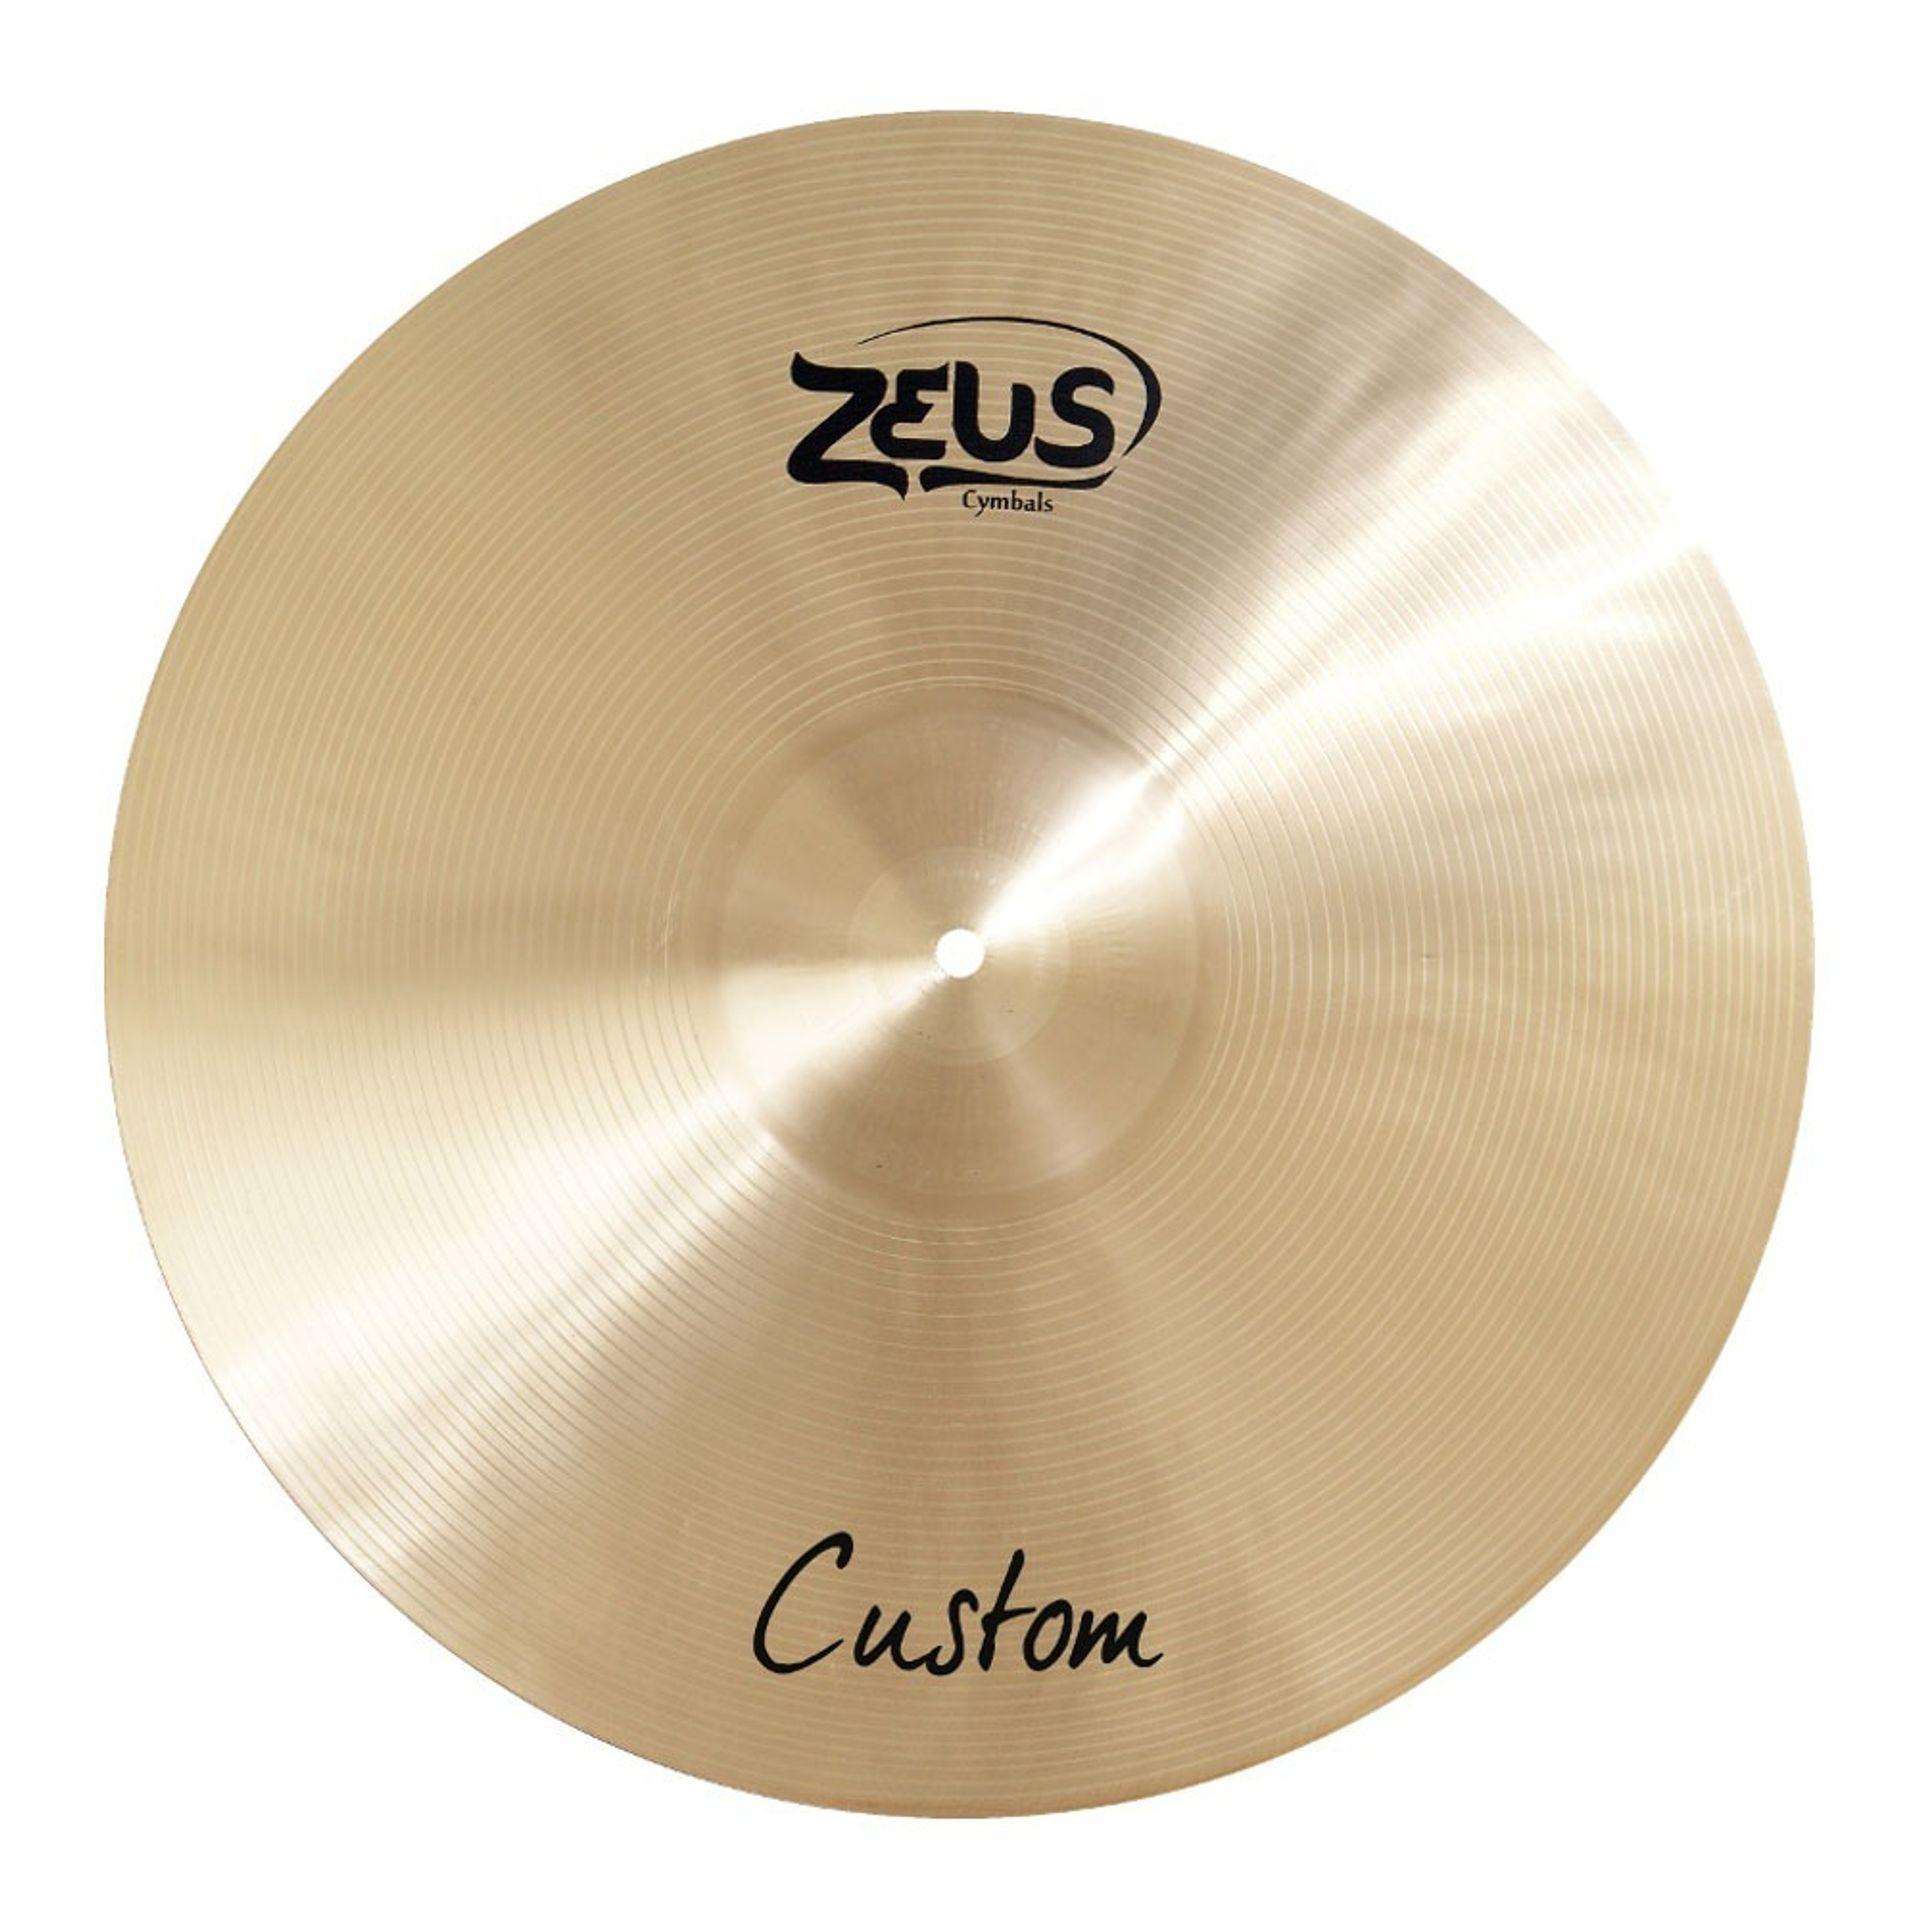 PRATO ZEUS CUSTOM CRASH 16 ZCC16 - X5Music